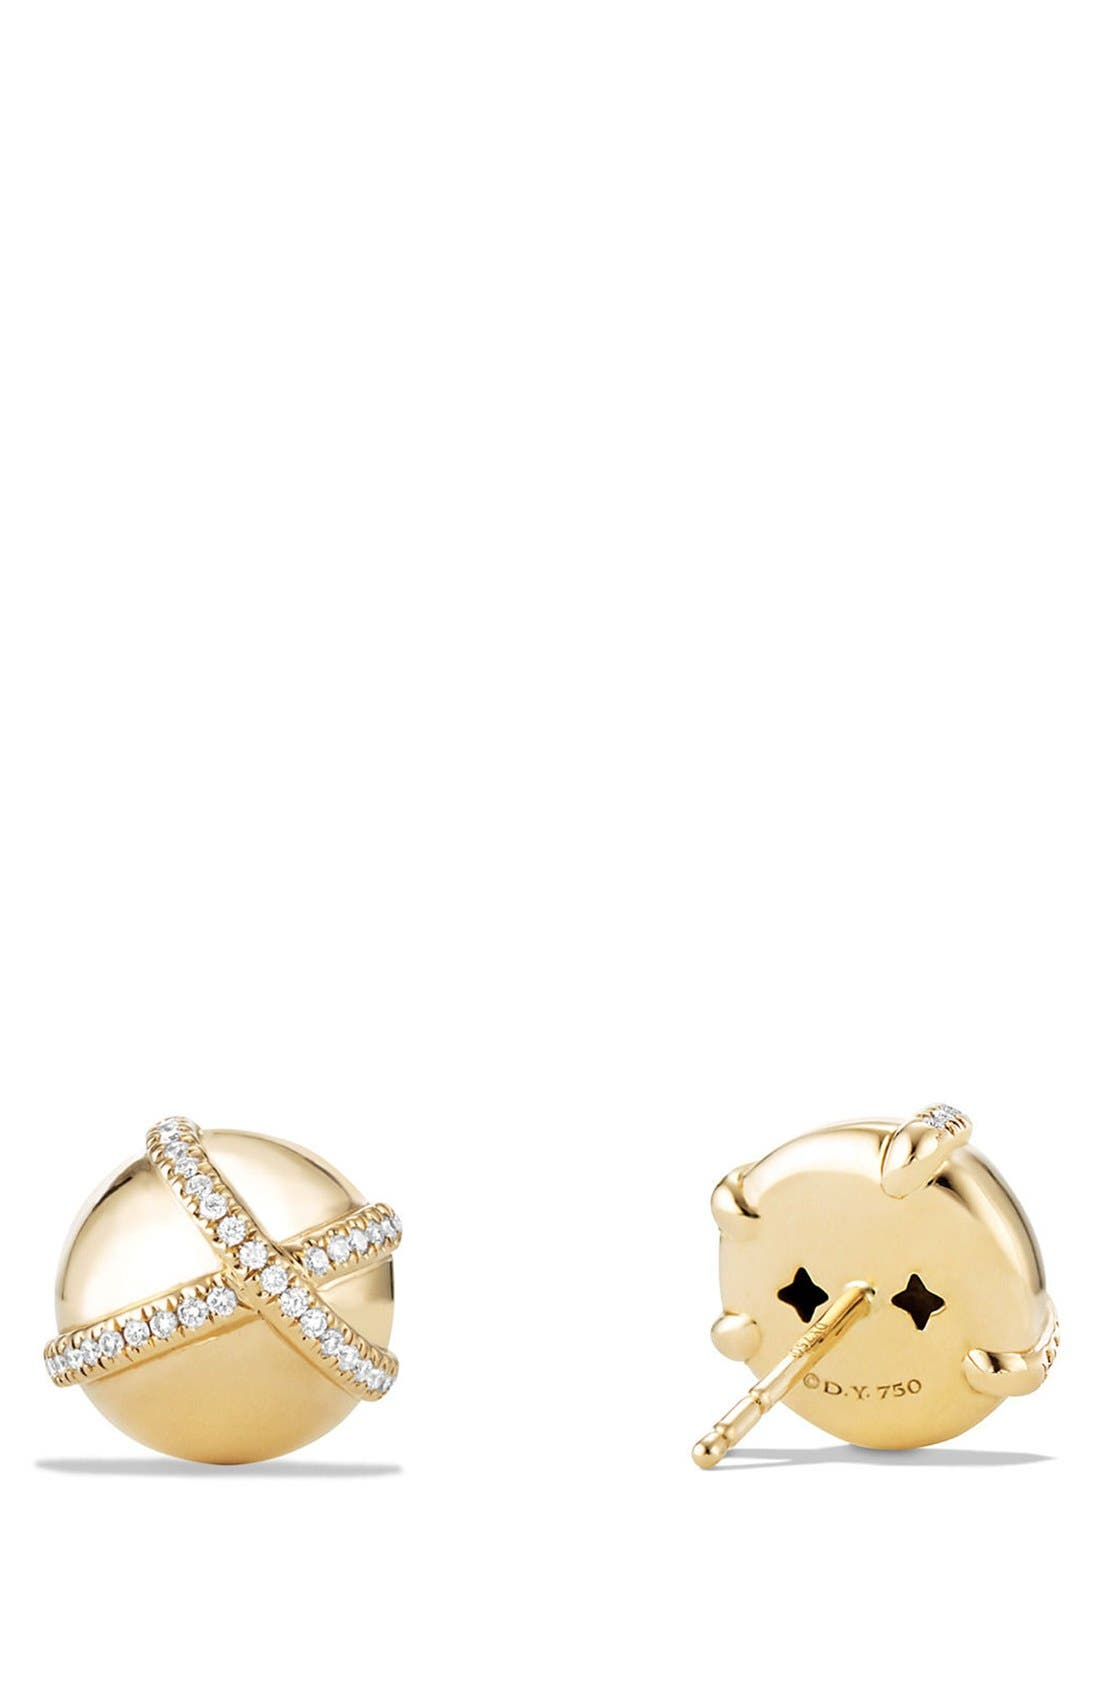 Alternate Image 2  - David Yurman 'Solari' Wrap Stud Earrings with Pavé Diamonds in 18K Gold